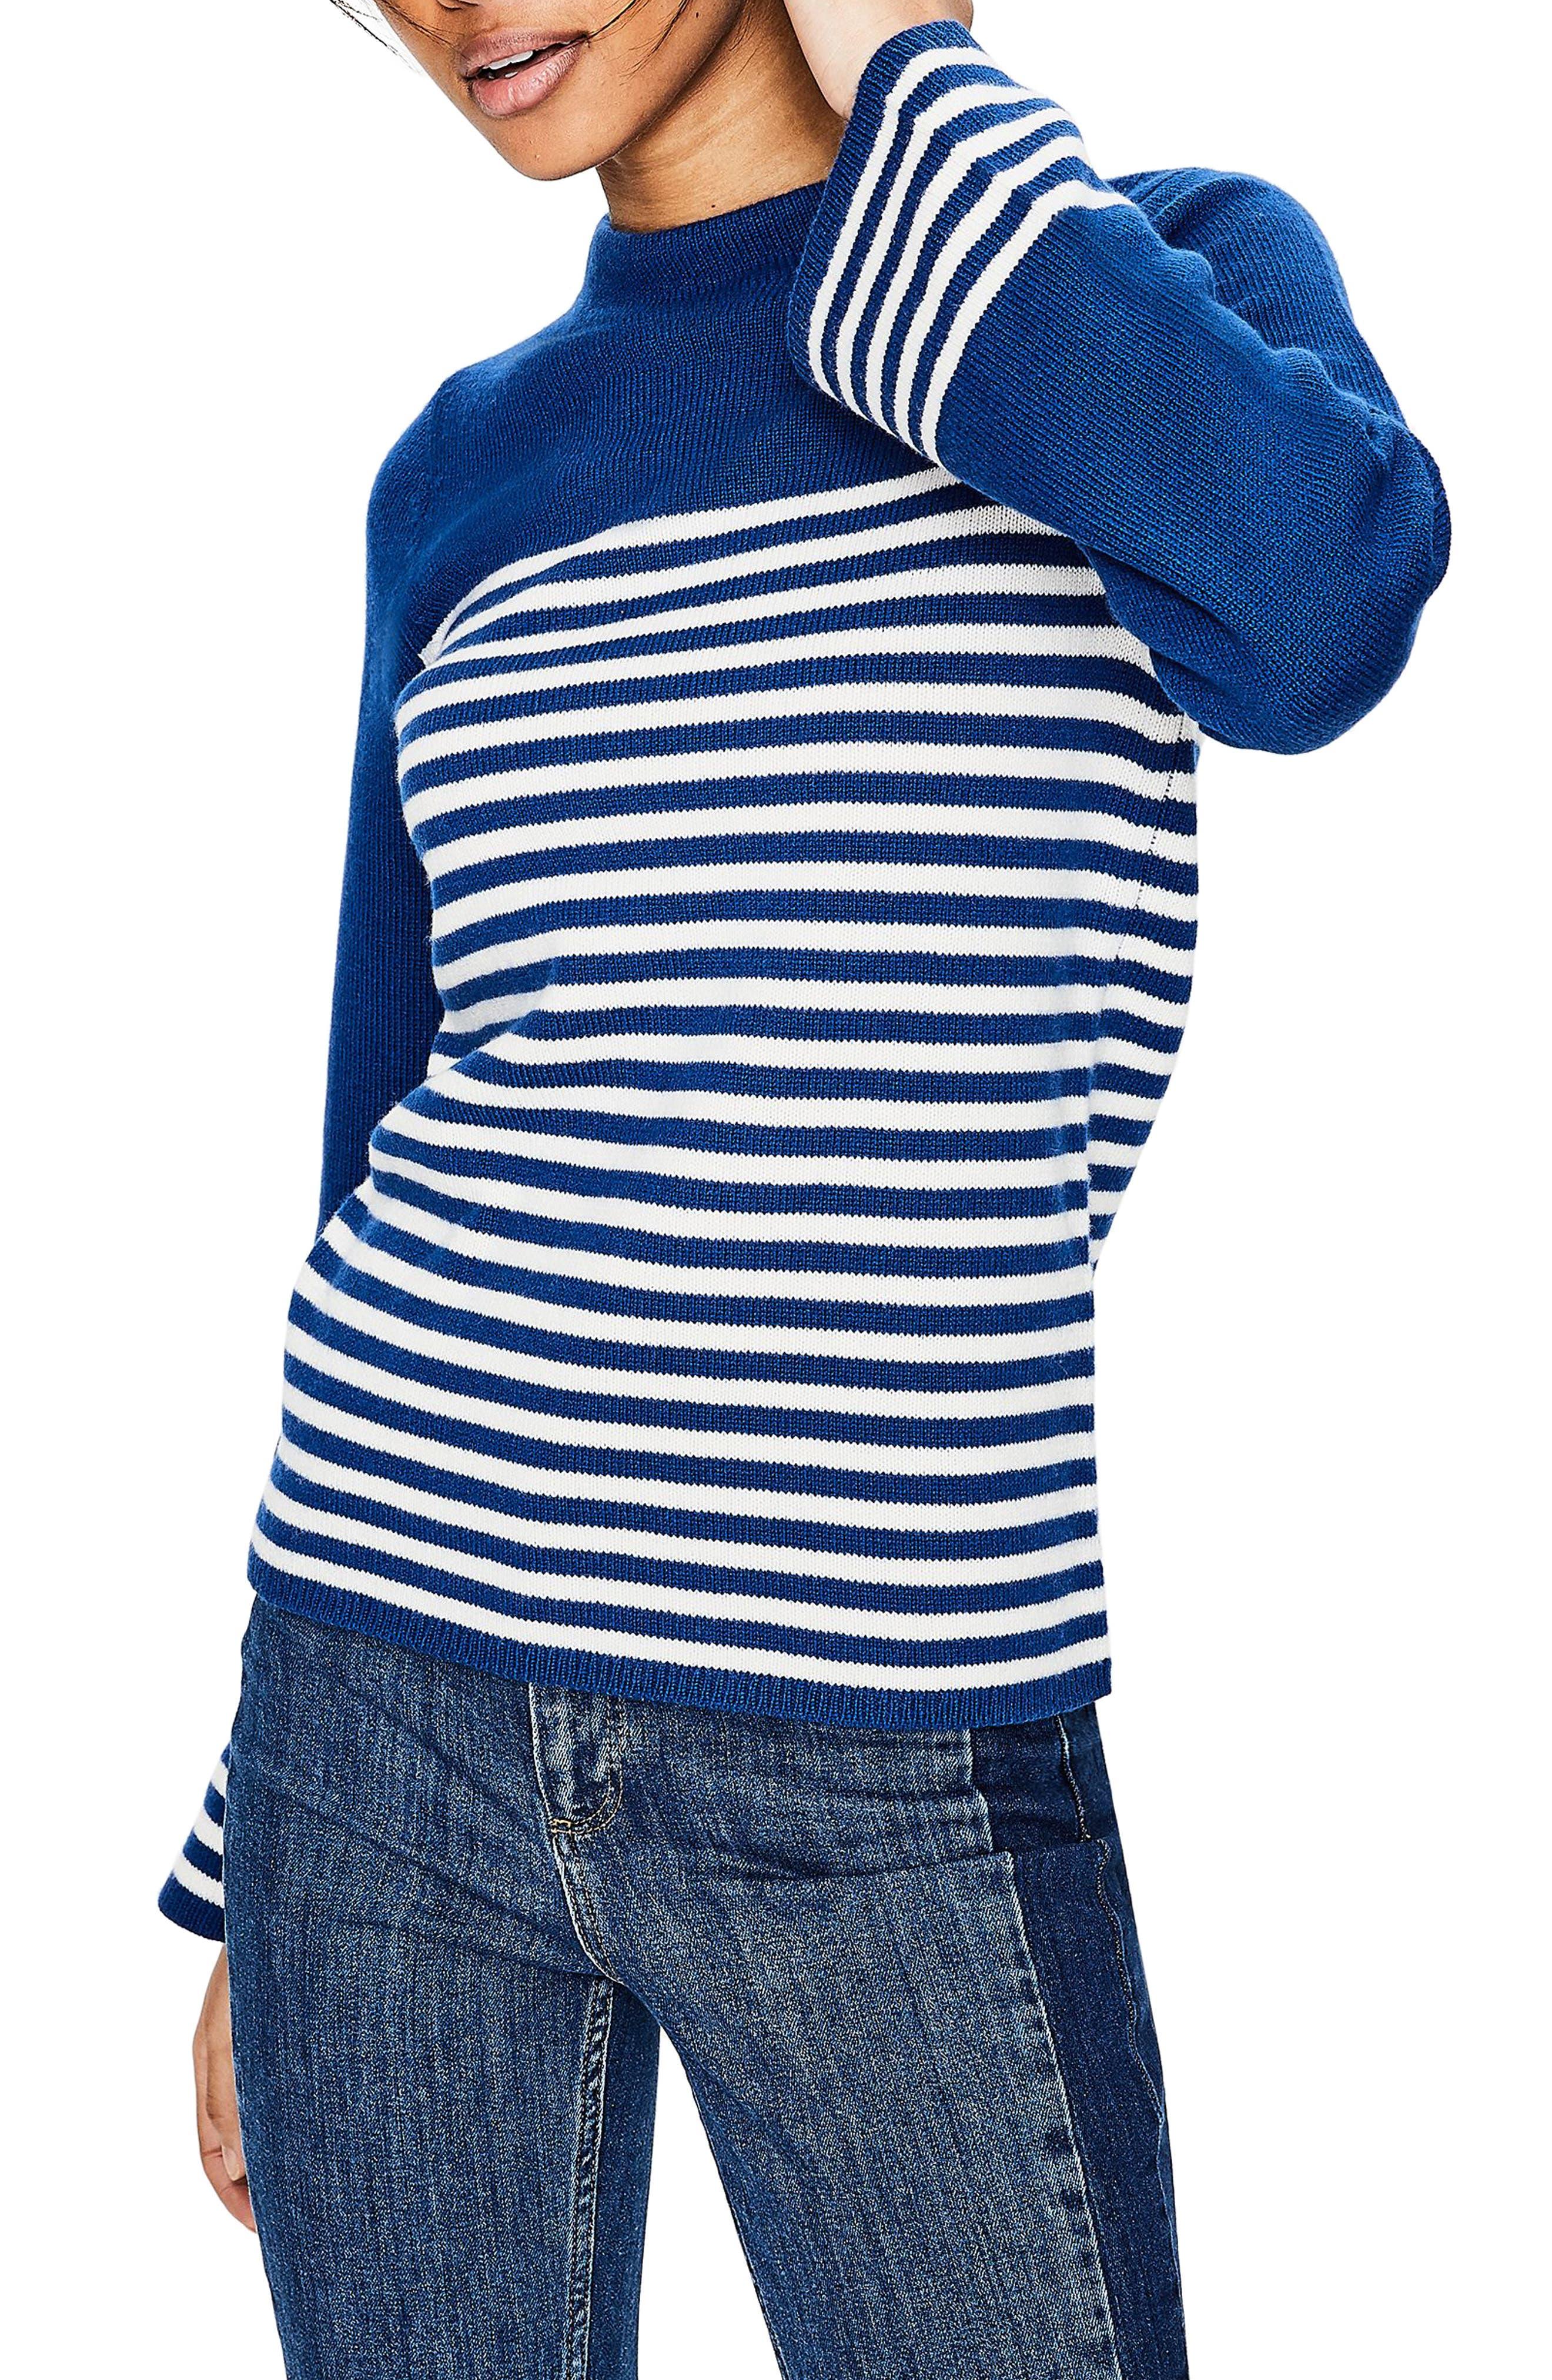 Boden Stripe Sweater